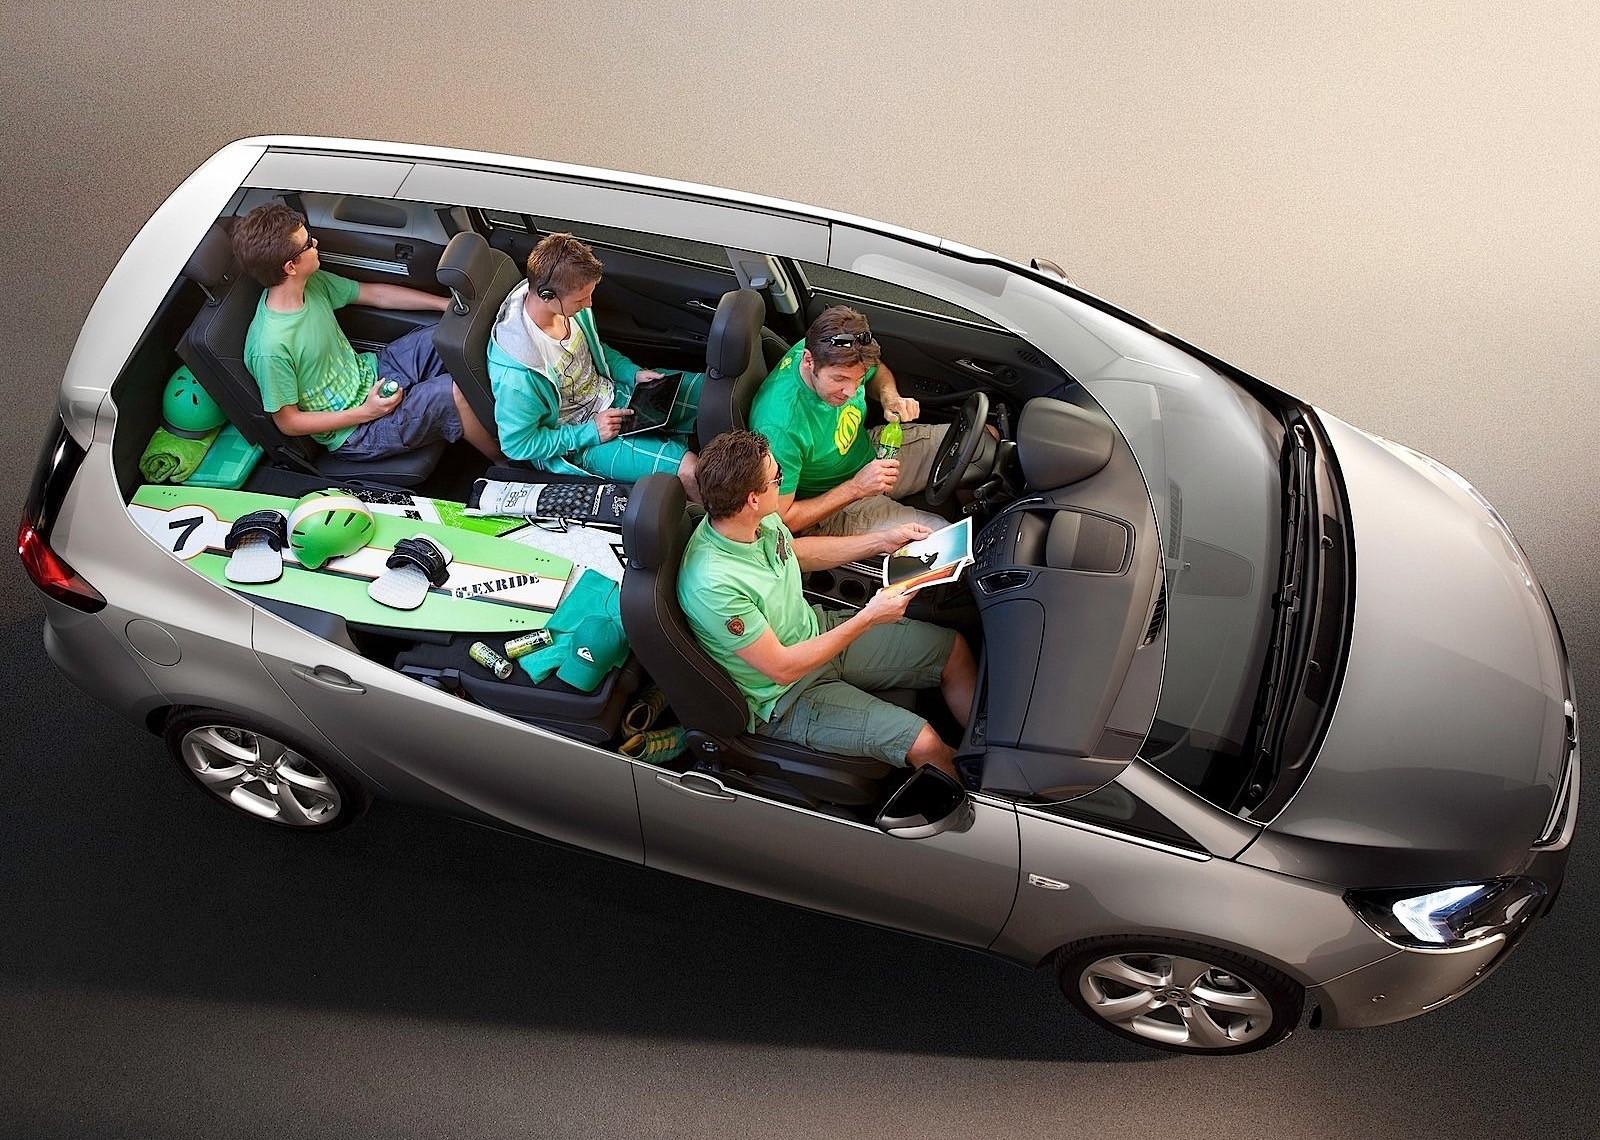 Opel Zafira 2011 Diesel >> OPEL Zafira Tourer specs - 2011, 2012, 2013, 2014, 2015, 2016 - autoevolution